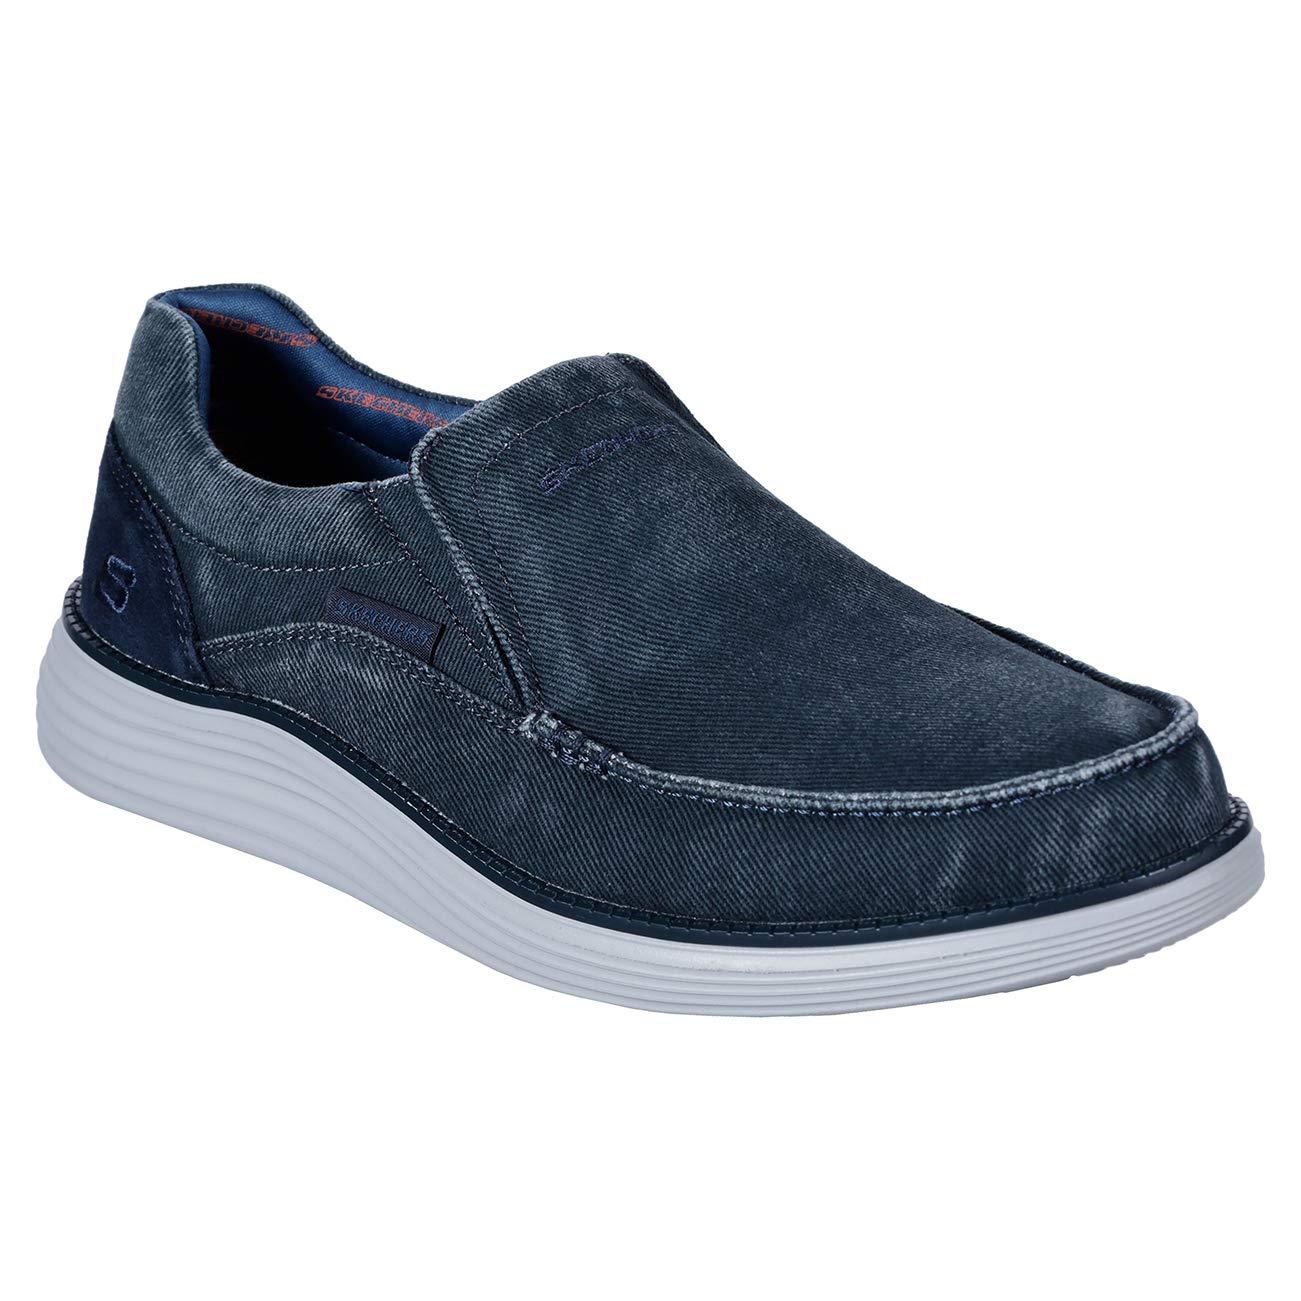 bluee (bluee blue) Skechers Men's's Status 2.0-Mosent Moccasins